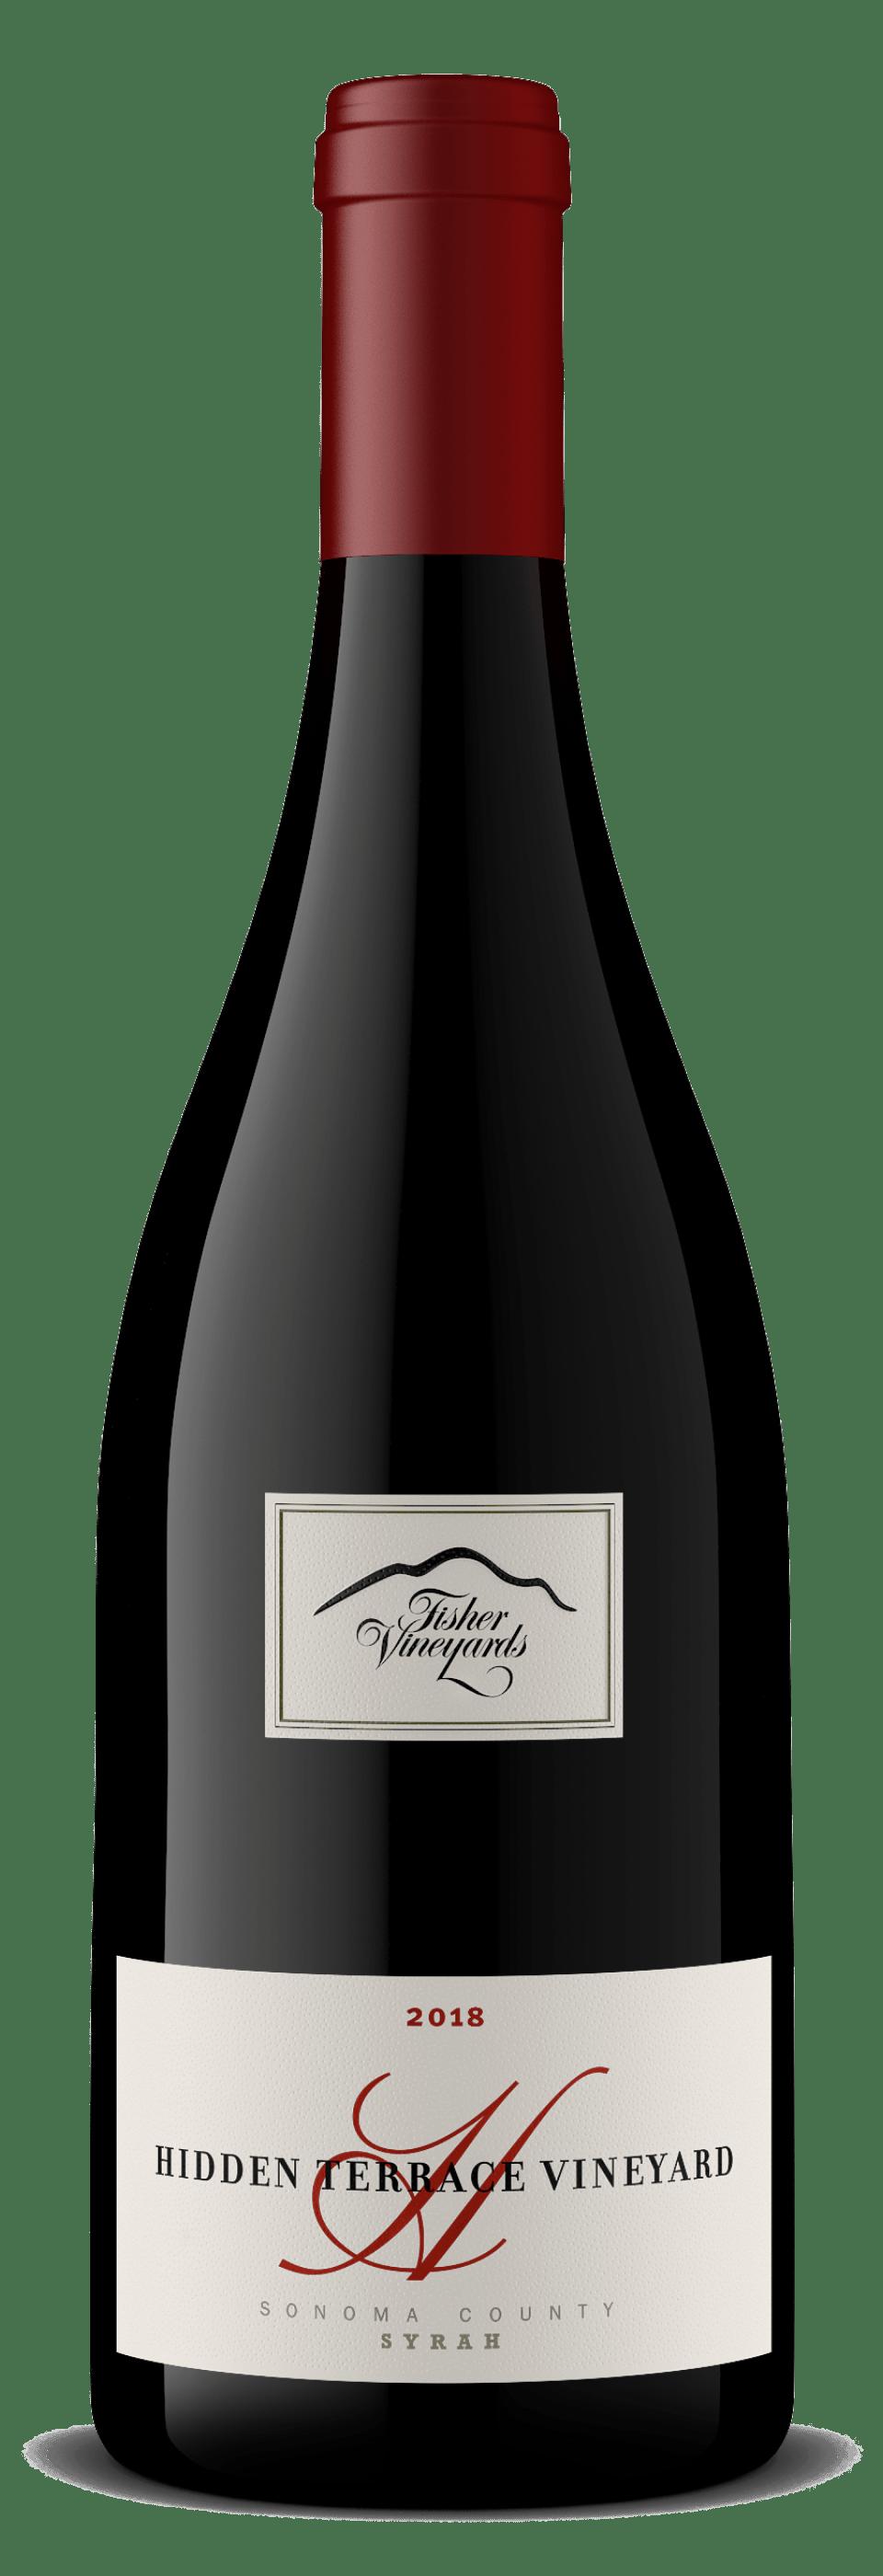 2018 Hidden Terrace Vineyard